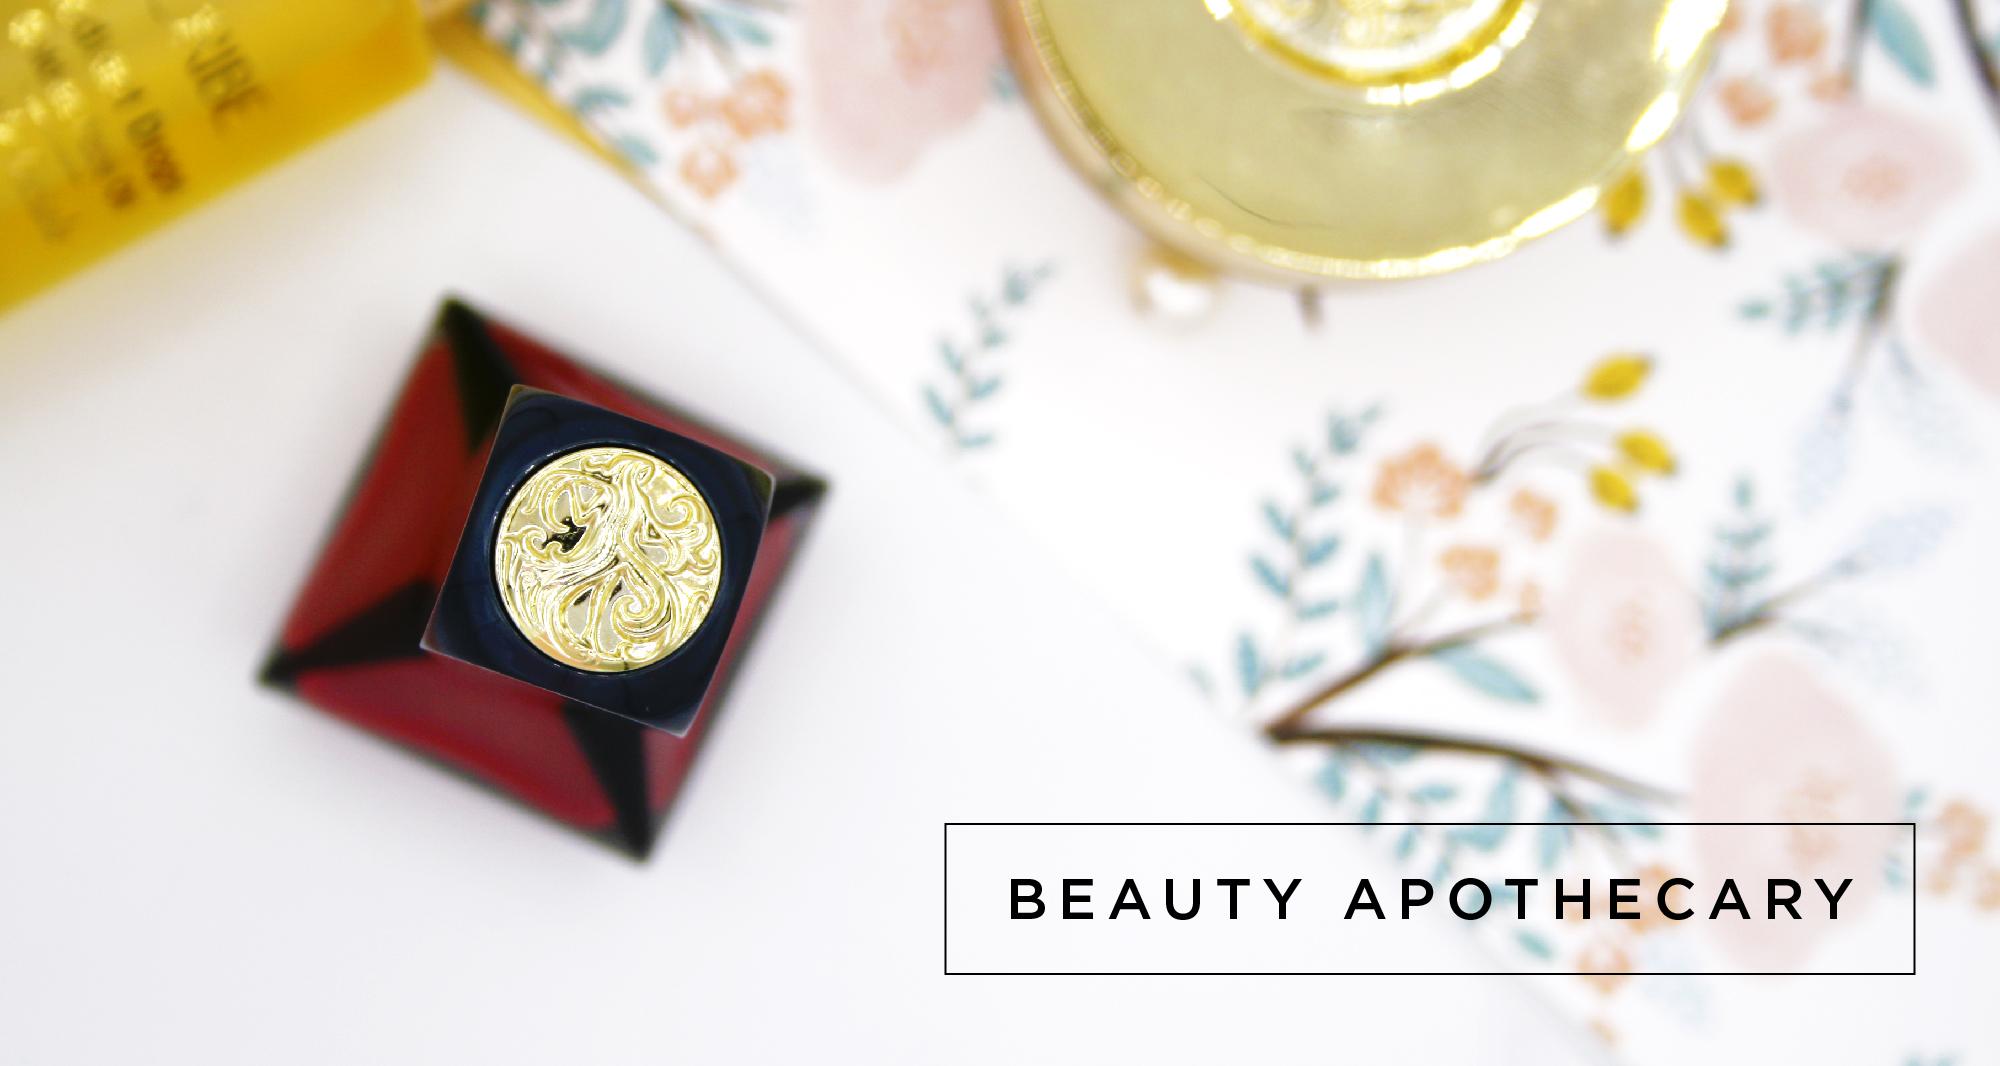 INTERLOCKS Salon + Spa Beauty Apothecary